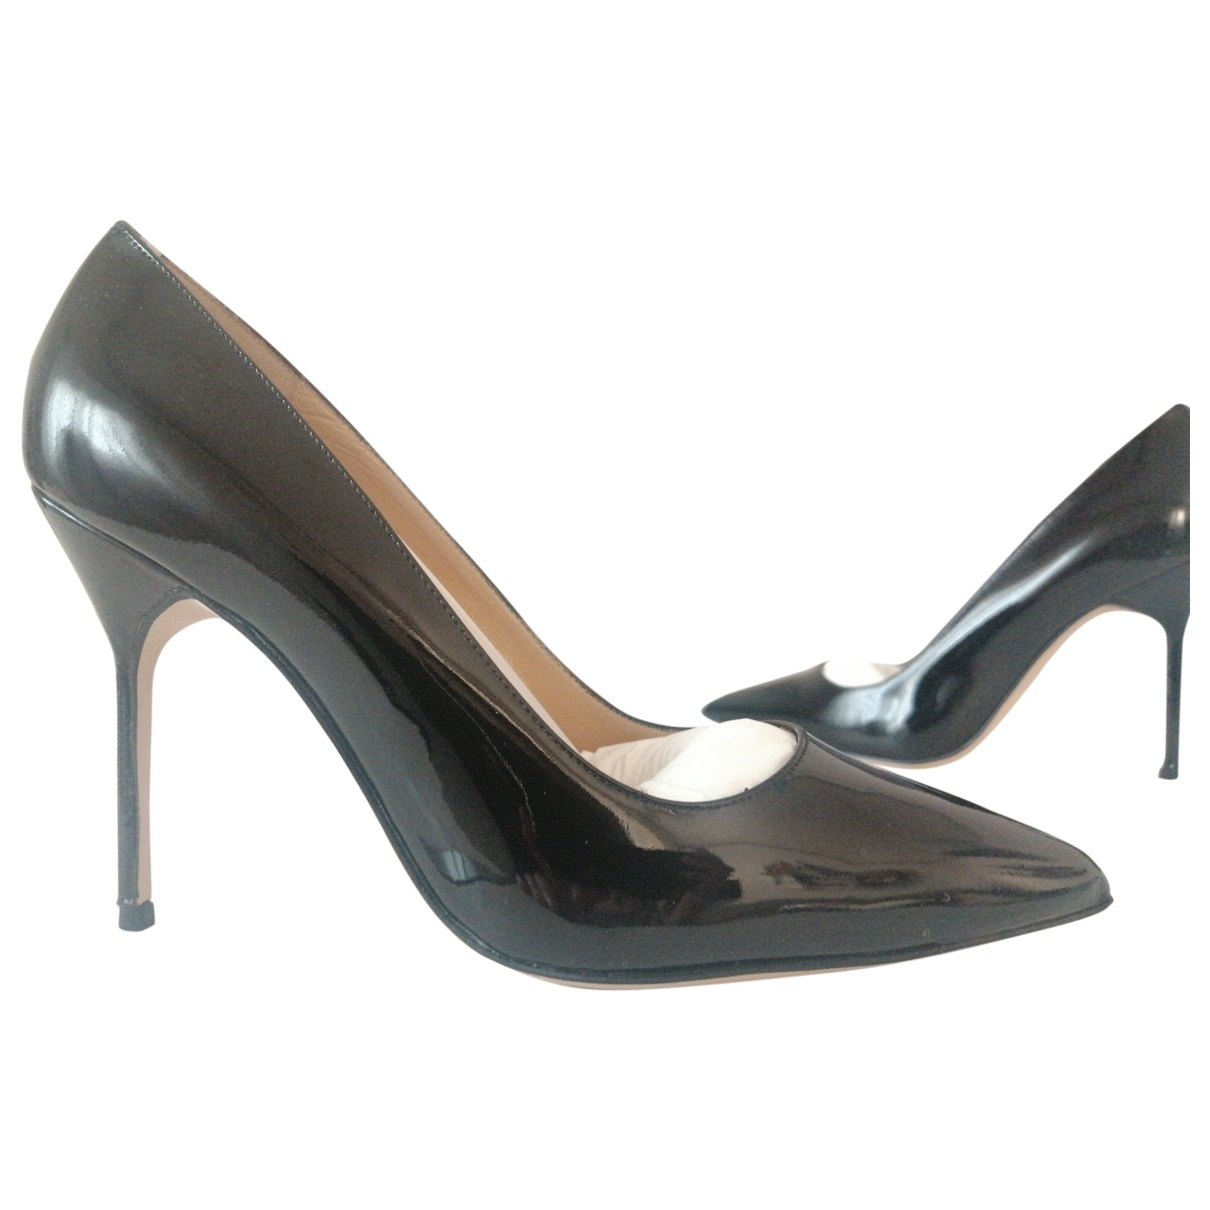 Manolo Blahnik \N Black Patent leather Heels for Women 37.5 EU